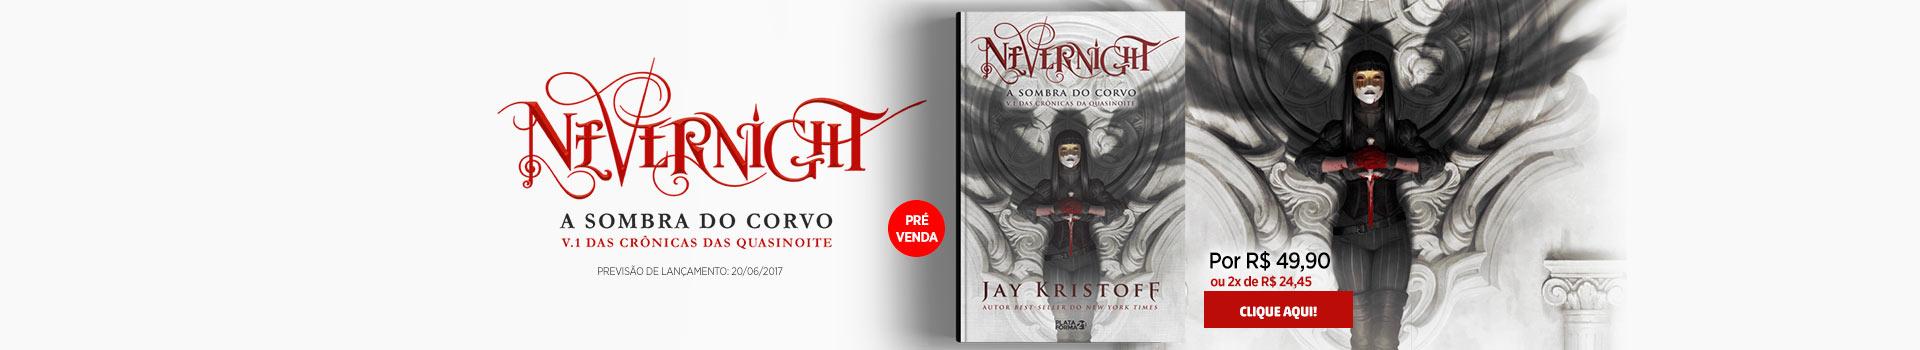 Nevernight - A Sombra do Corvo